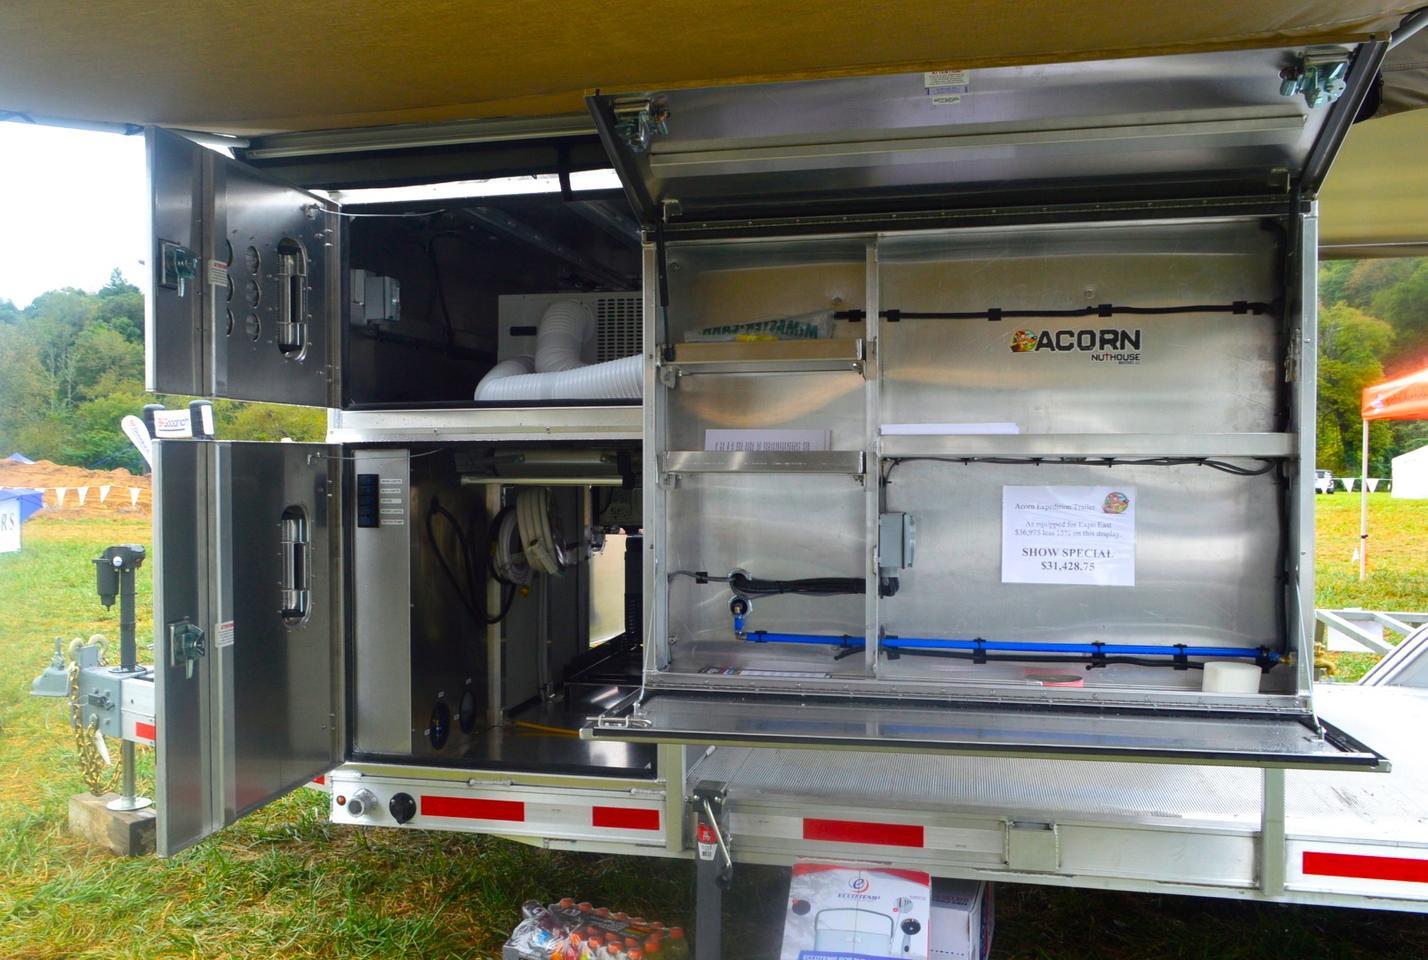 The Acorn's big aluminum boxesprovide plenty of workspace and storage